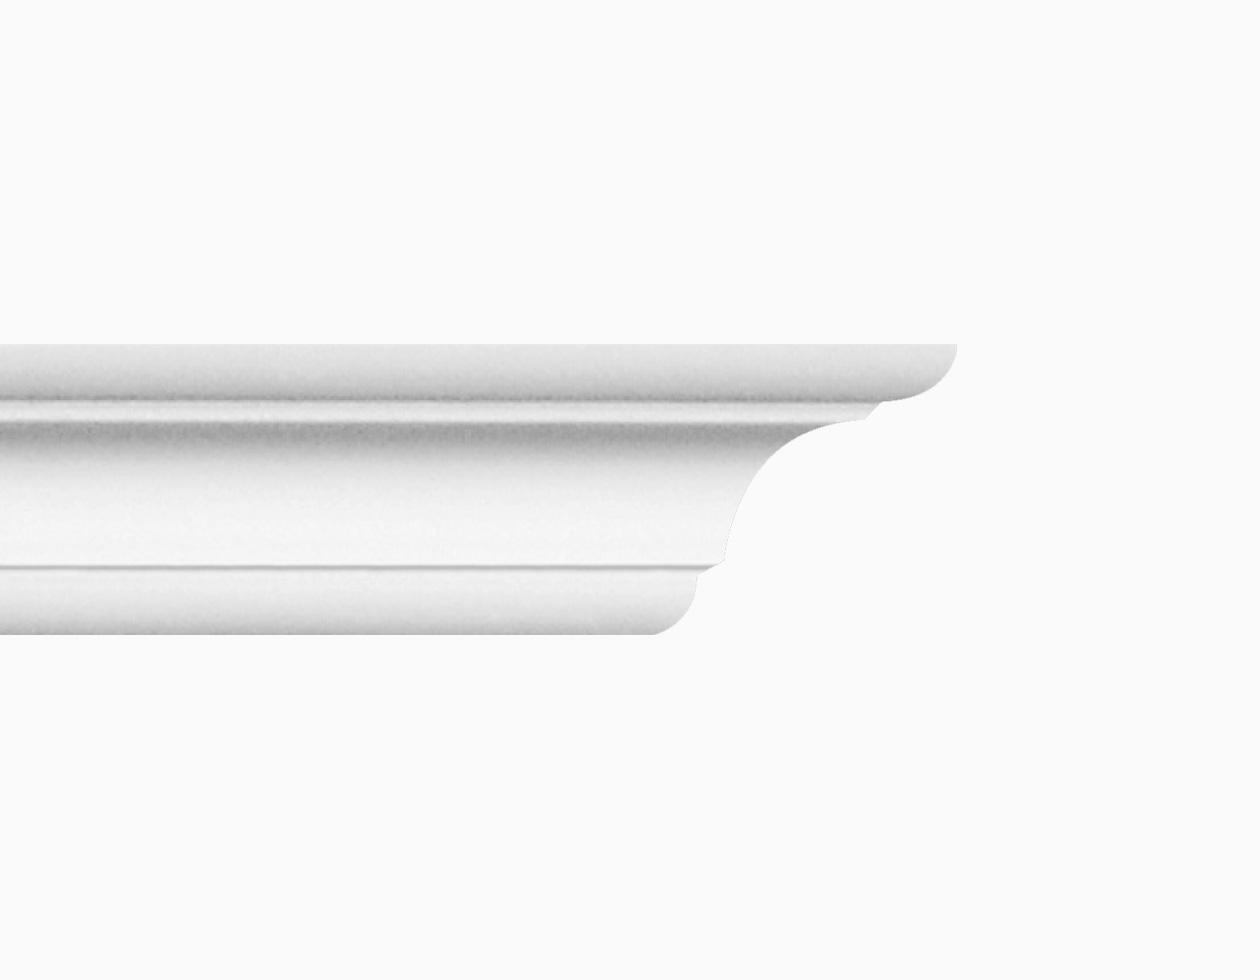 Styropor Material Deckenleisten Leisten Outlet